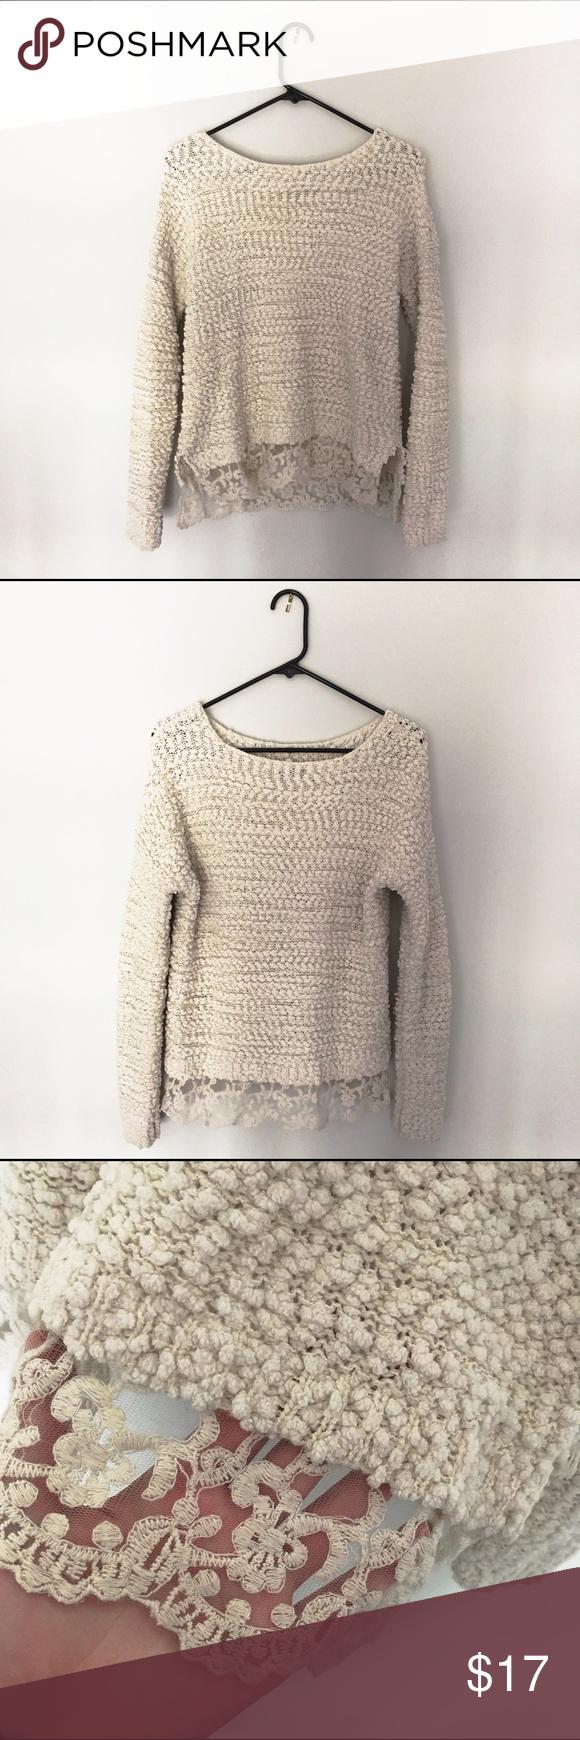 Soft Cream Sweater | Cotton sweater